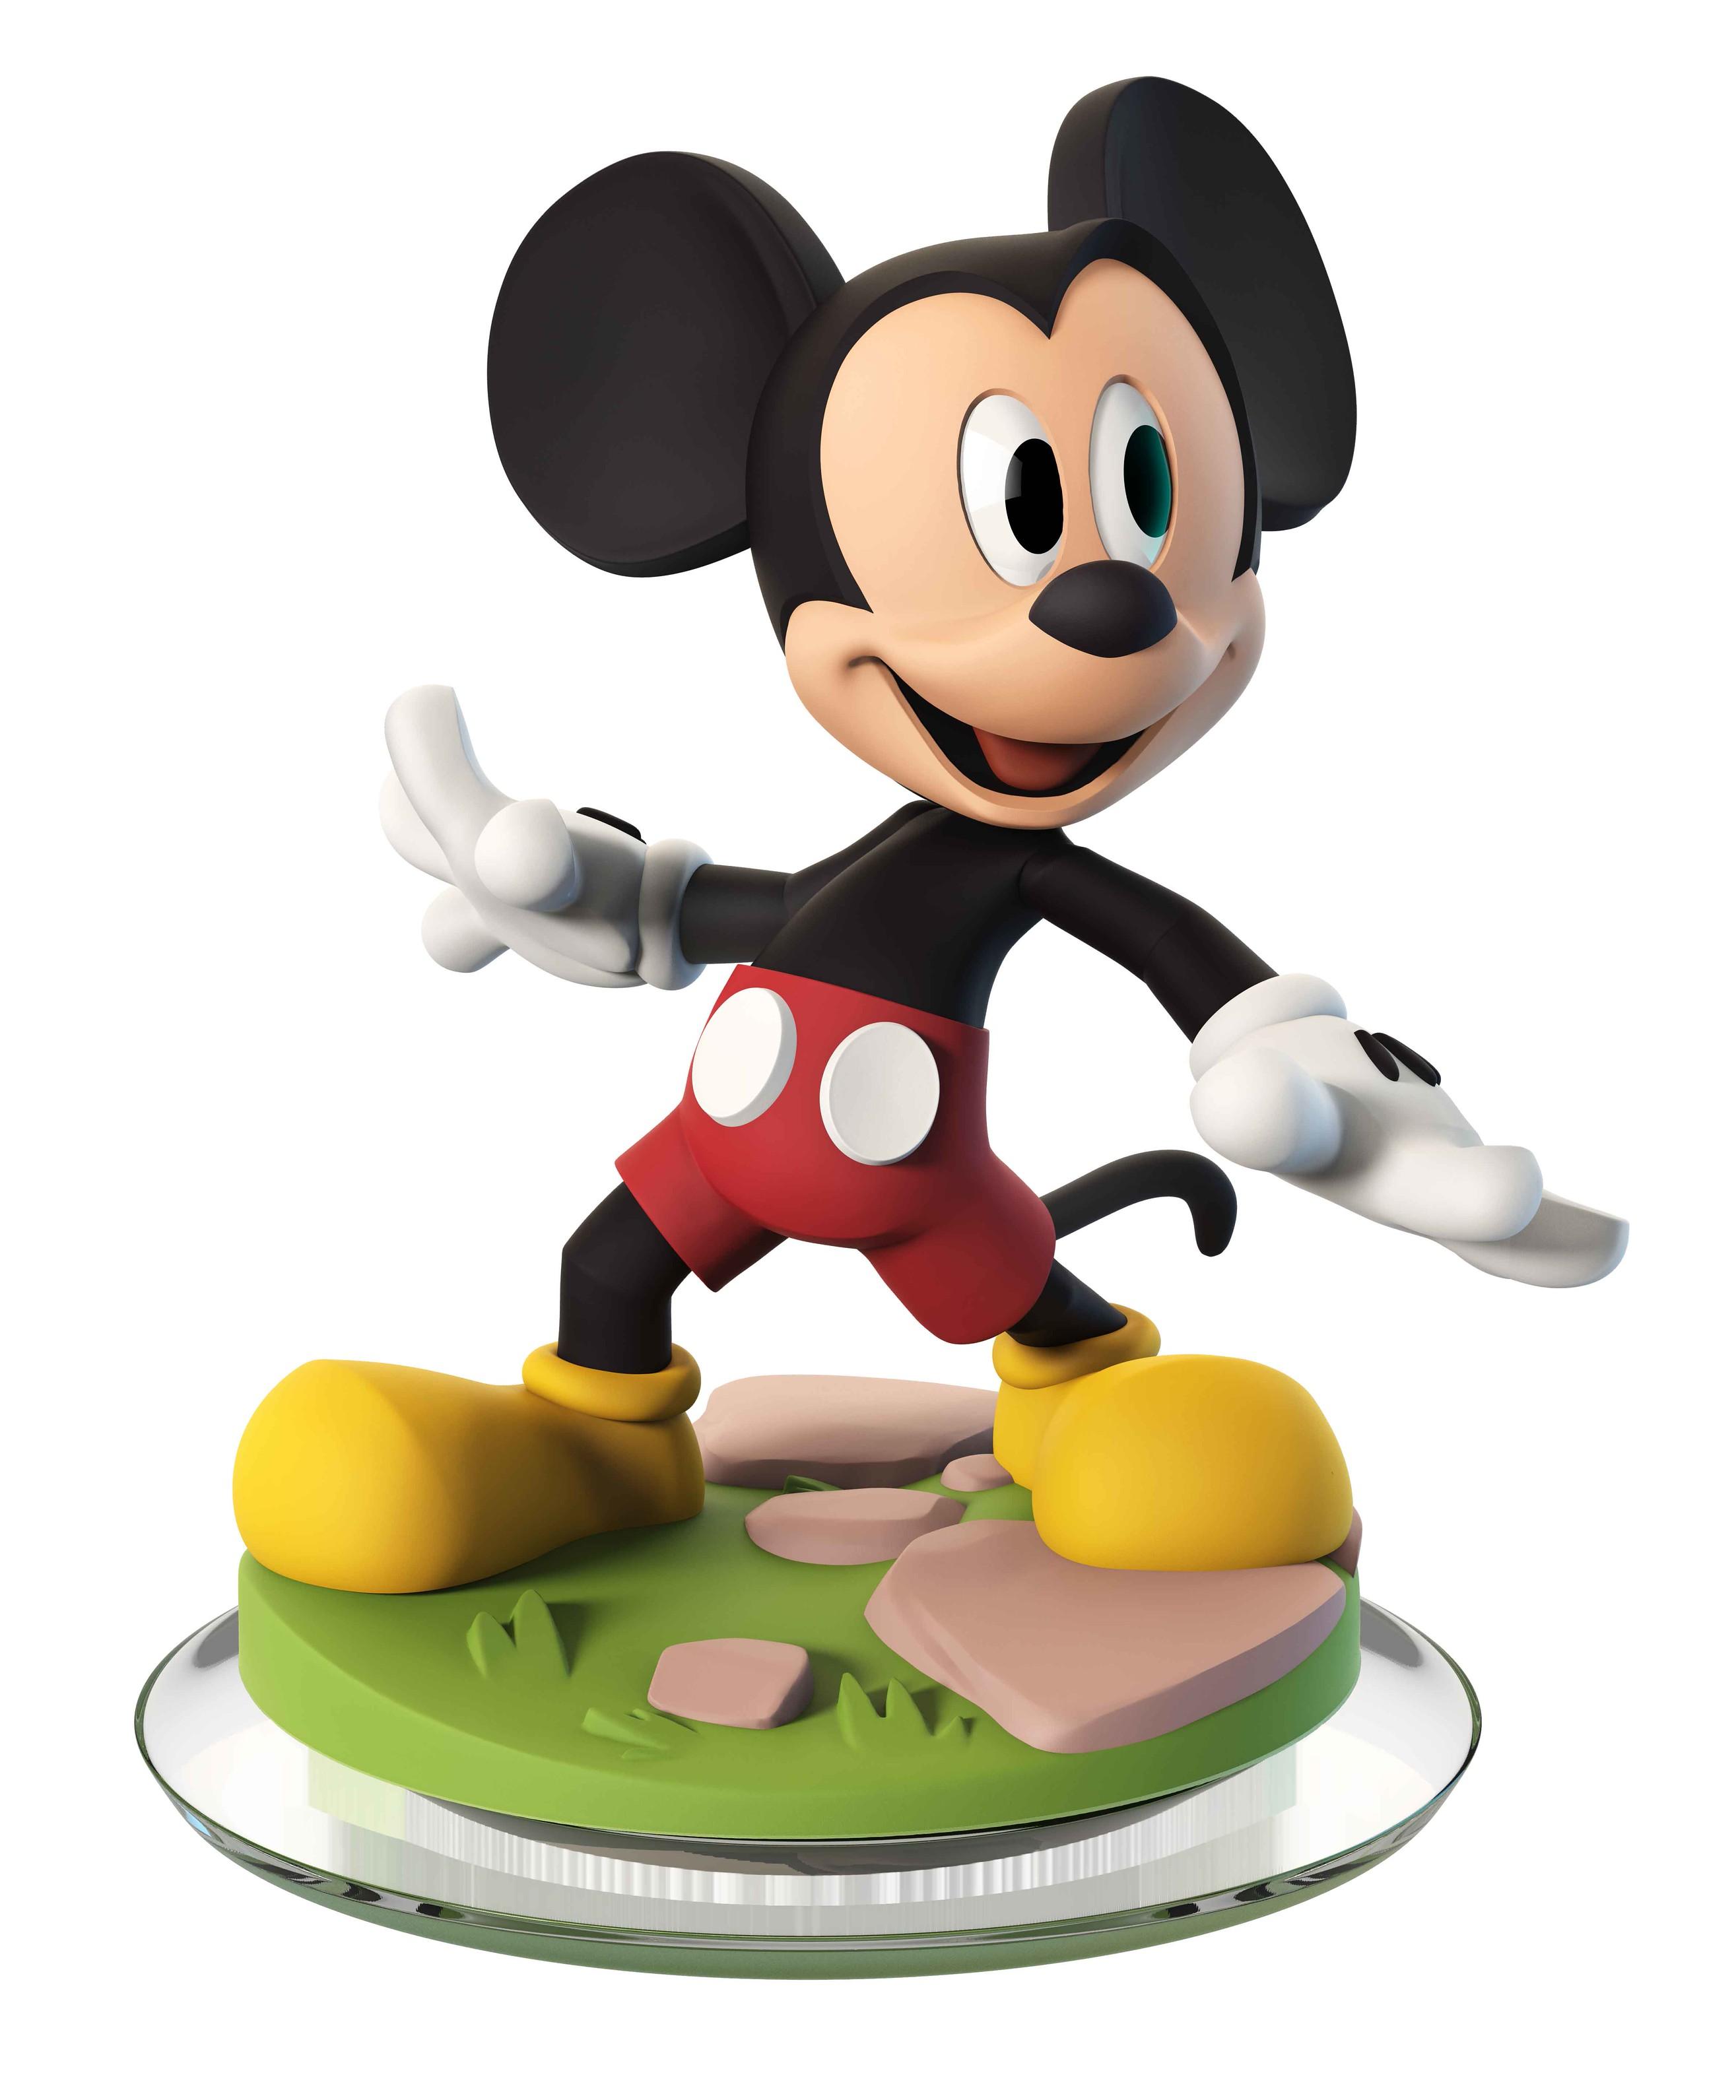 Disney Infinity 3.0 - Disney Figures Review ...